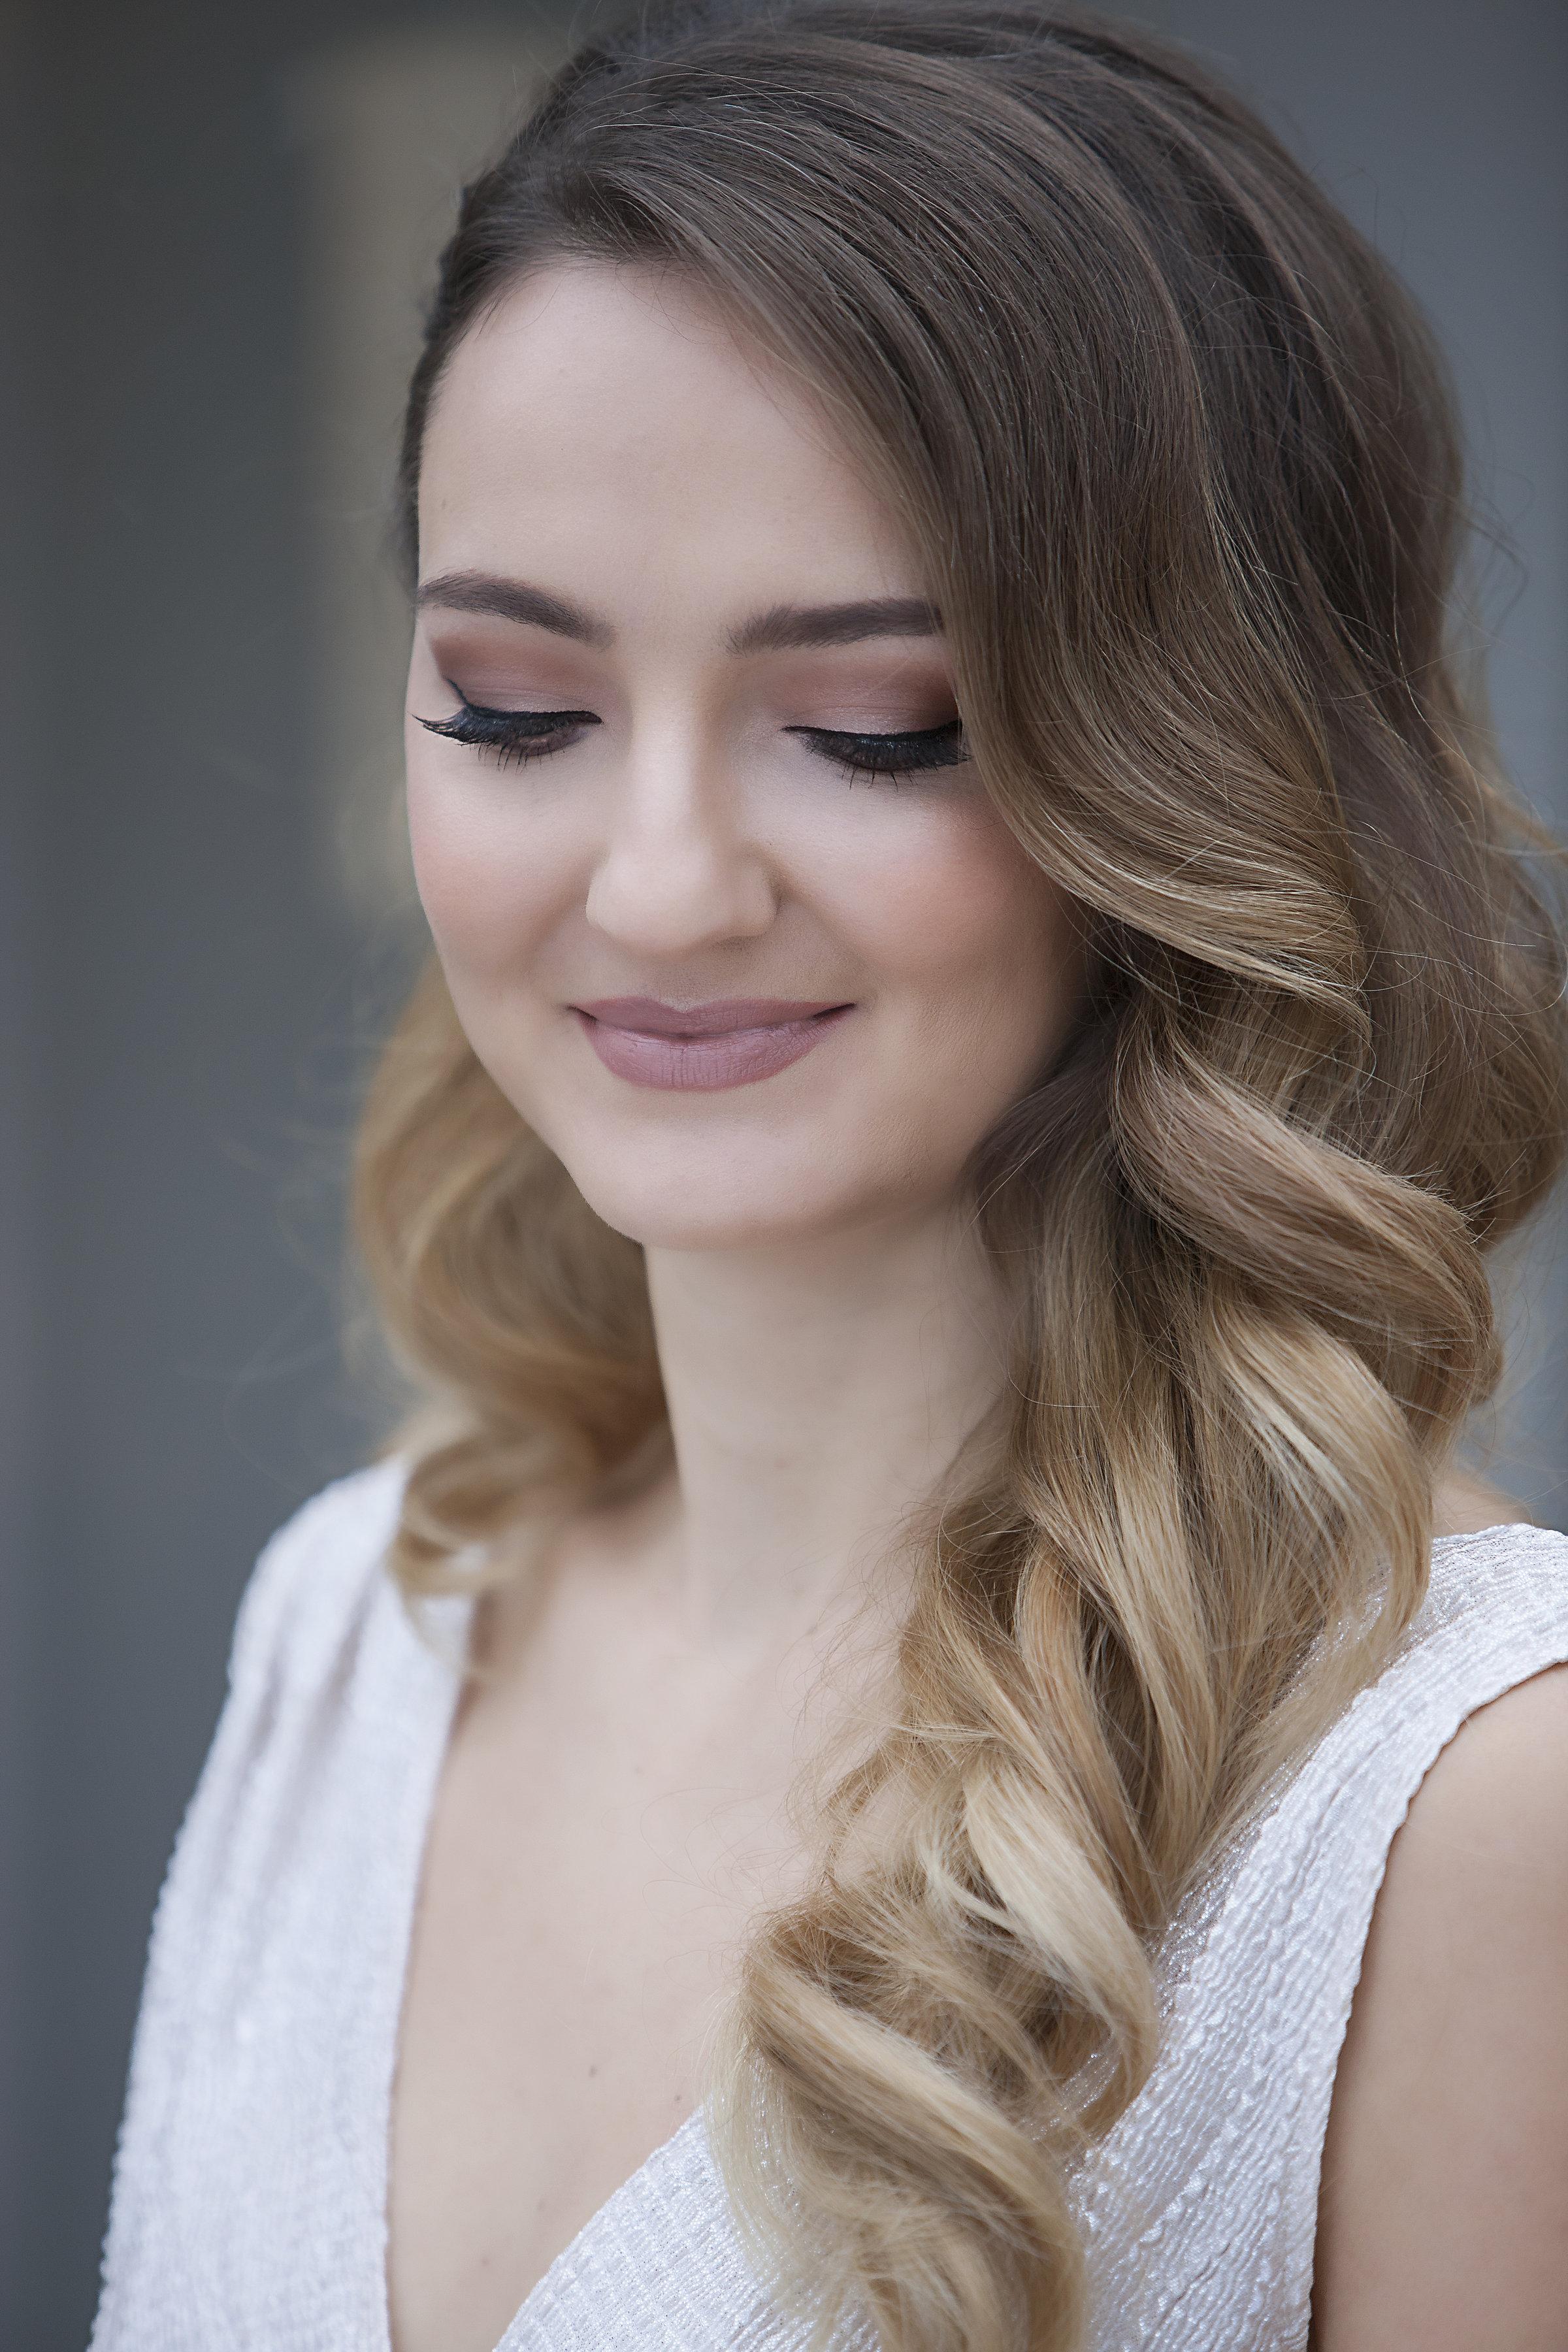 Hair & Makeup by Natasha